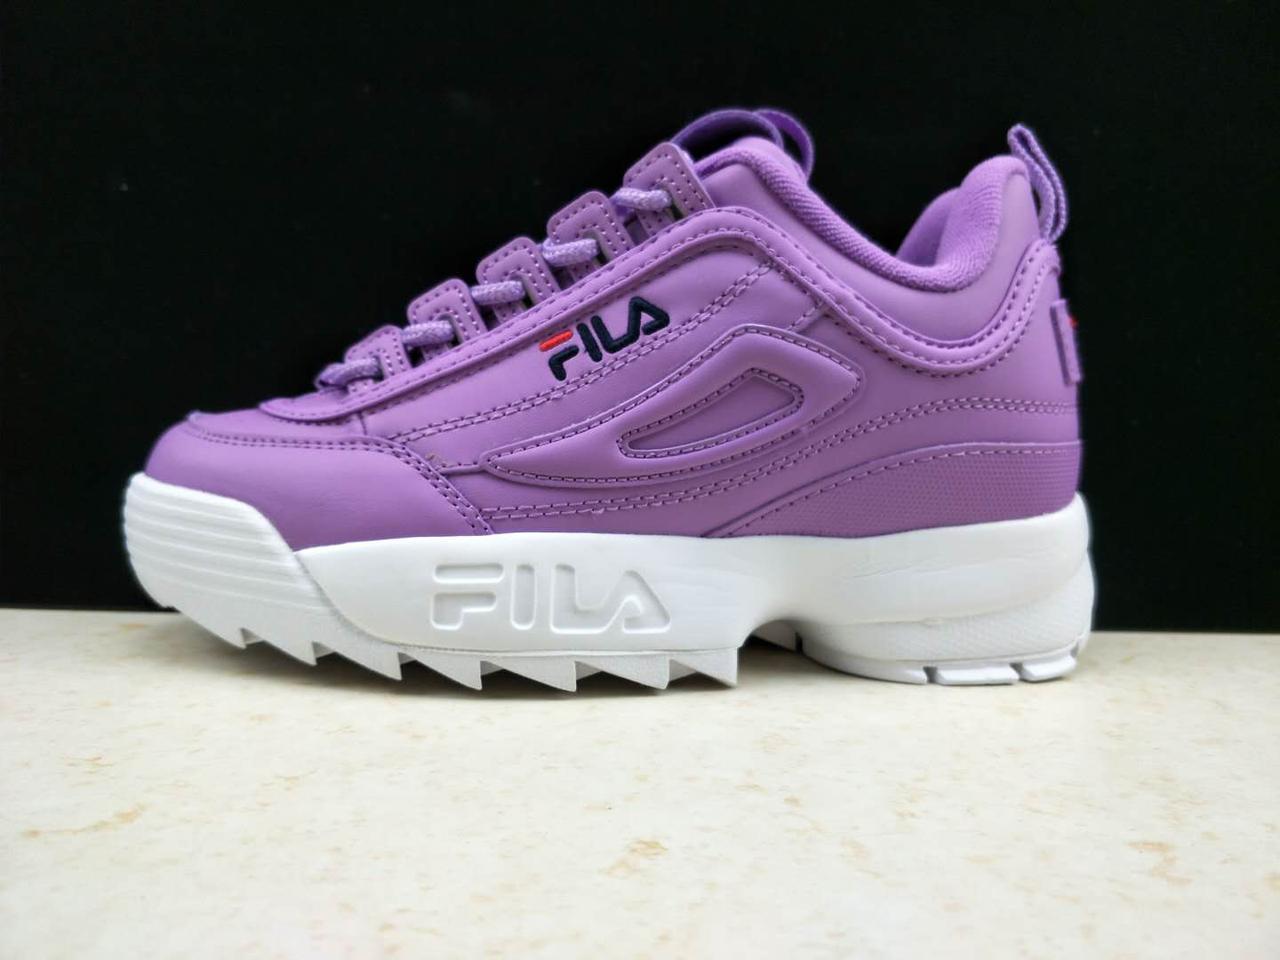 Женские Кроссовки Fila Disruptor II Leather Violet White — в ... 63440f582ed1b